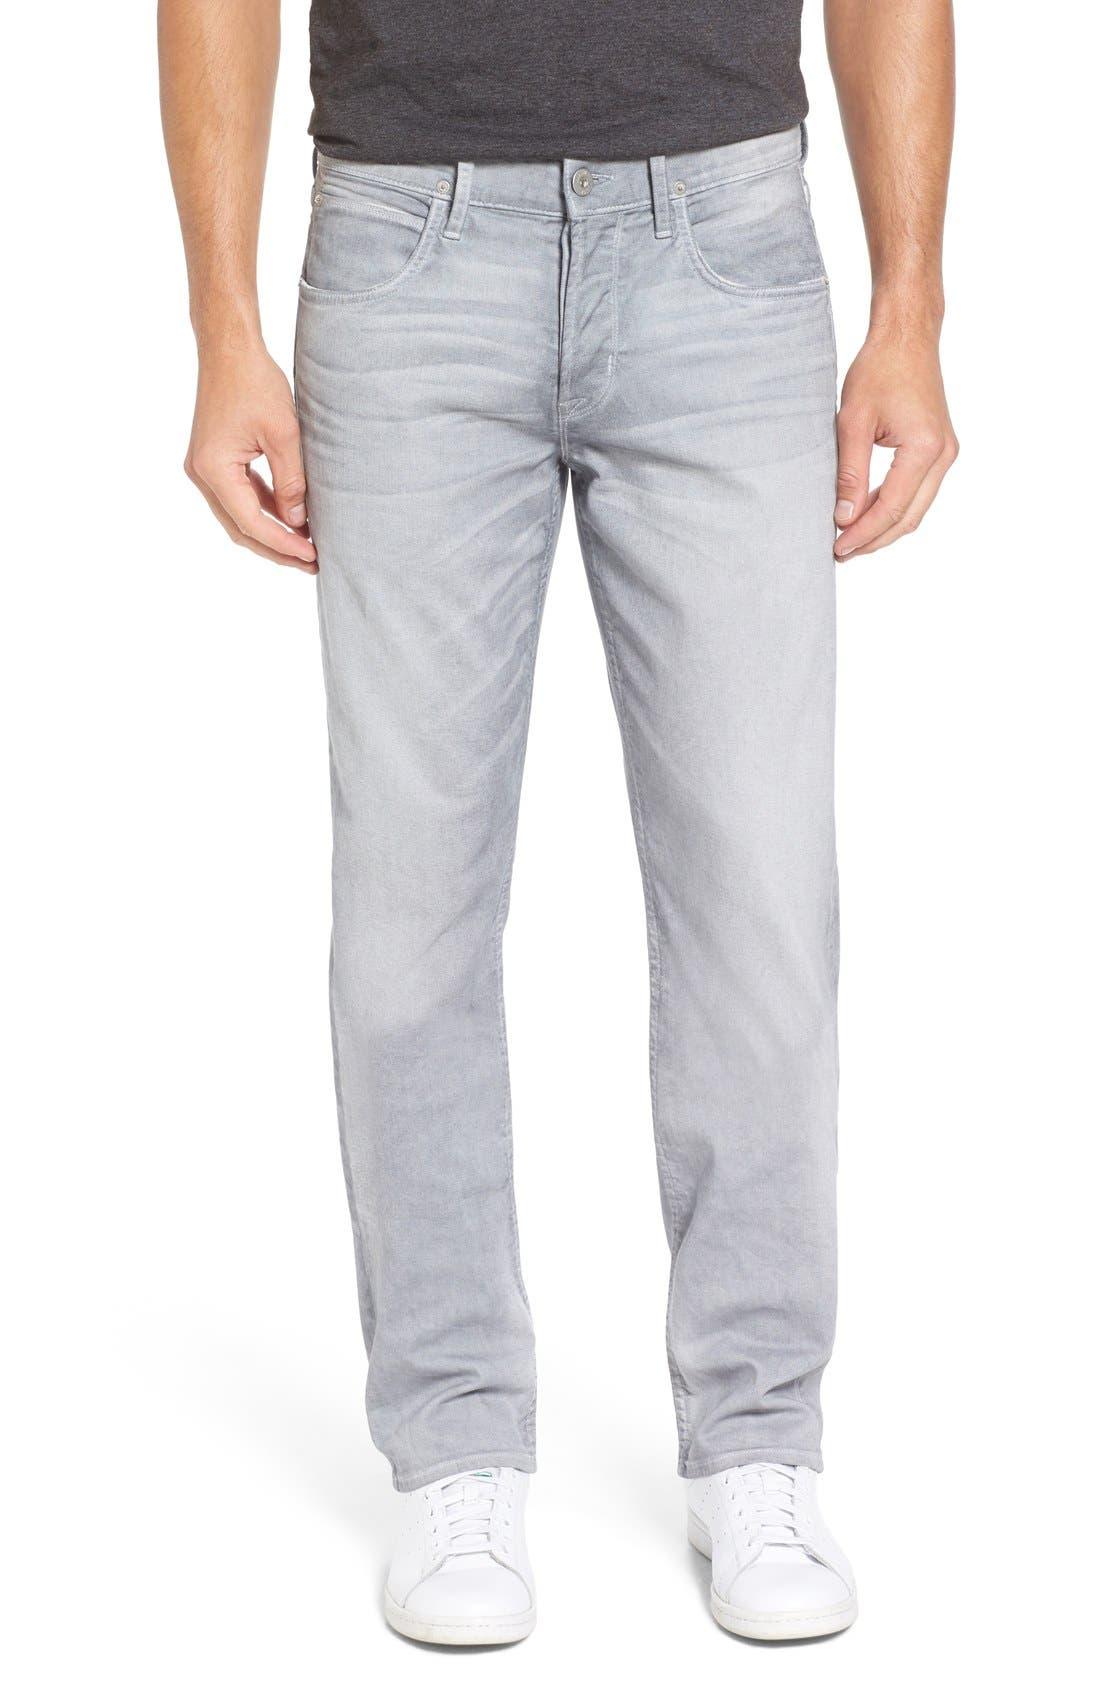 Alternate Image 1 Selected - Hudson Jeans Byron Slim Straight Leg Jeans (Militia Grey)